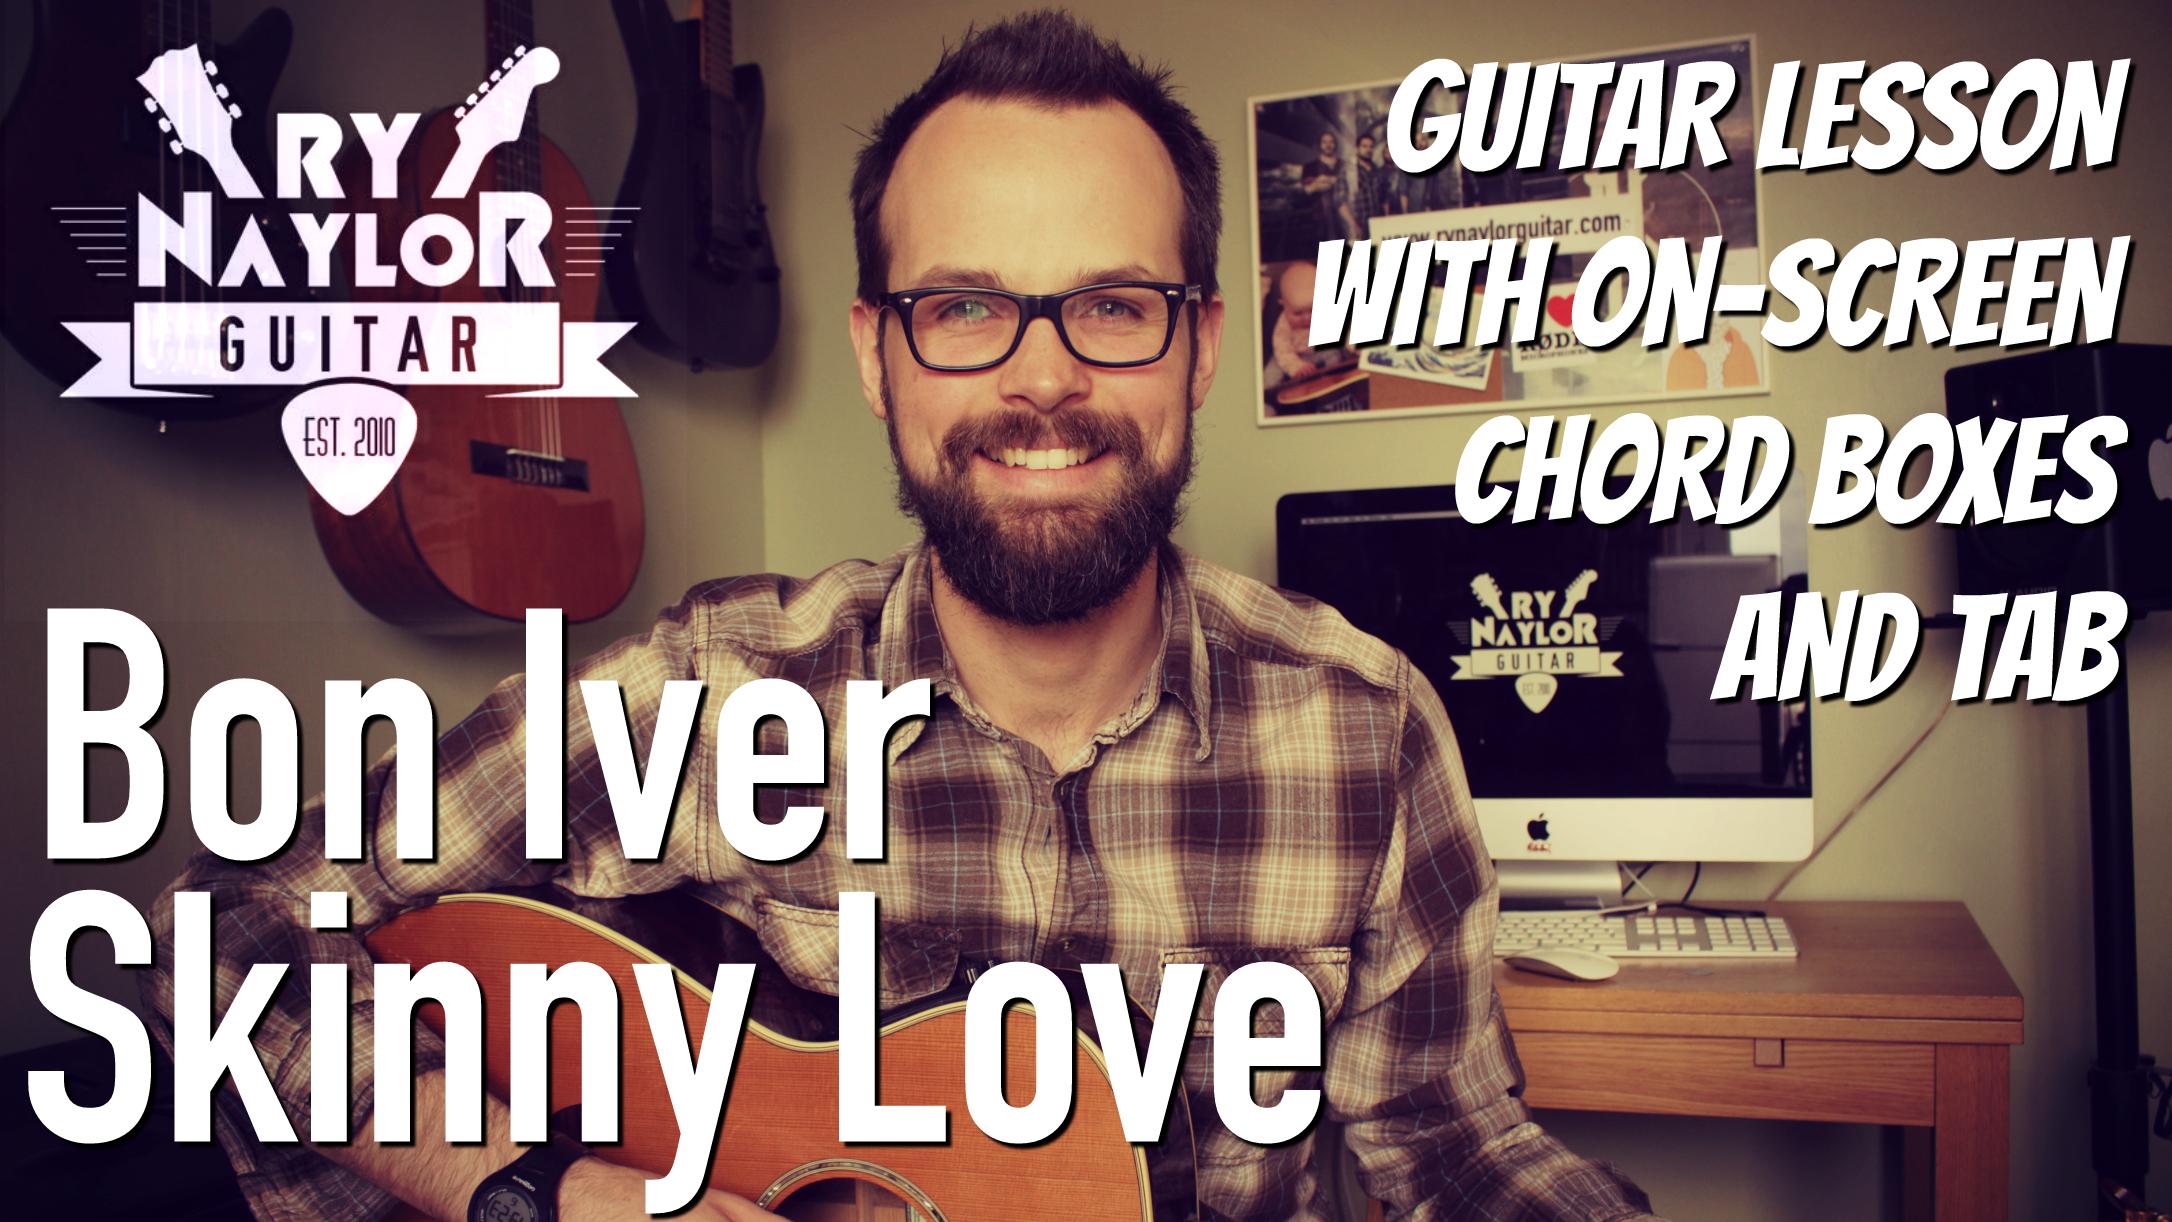 Ry Naylor Guitar Tab On Screen Chord Boxes Rhythm Slashes And